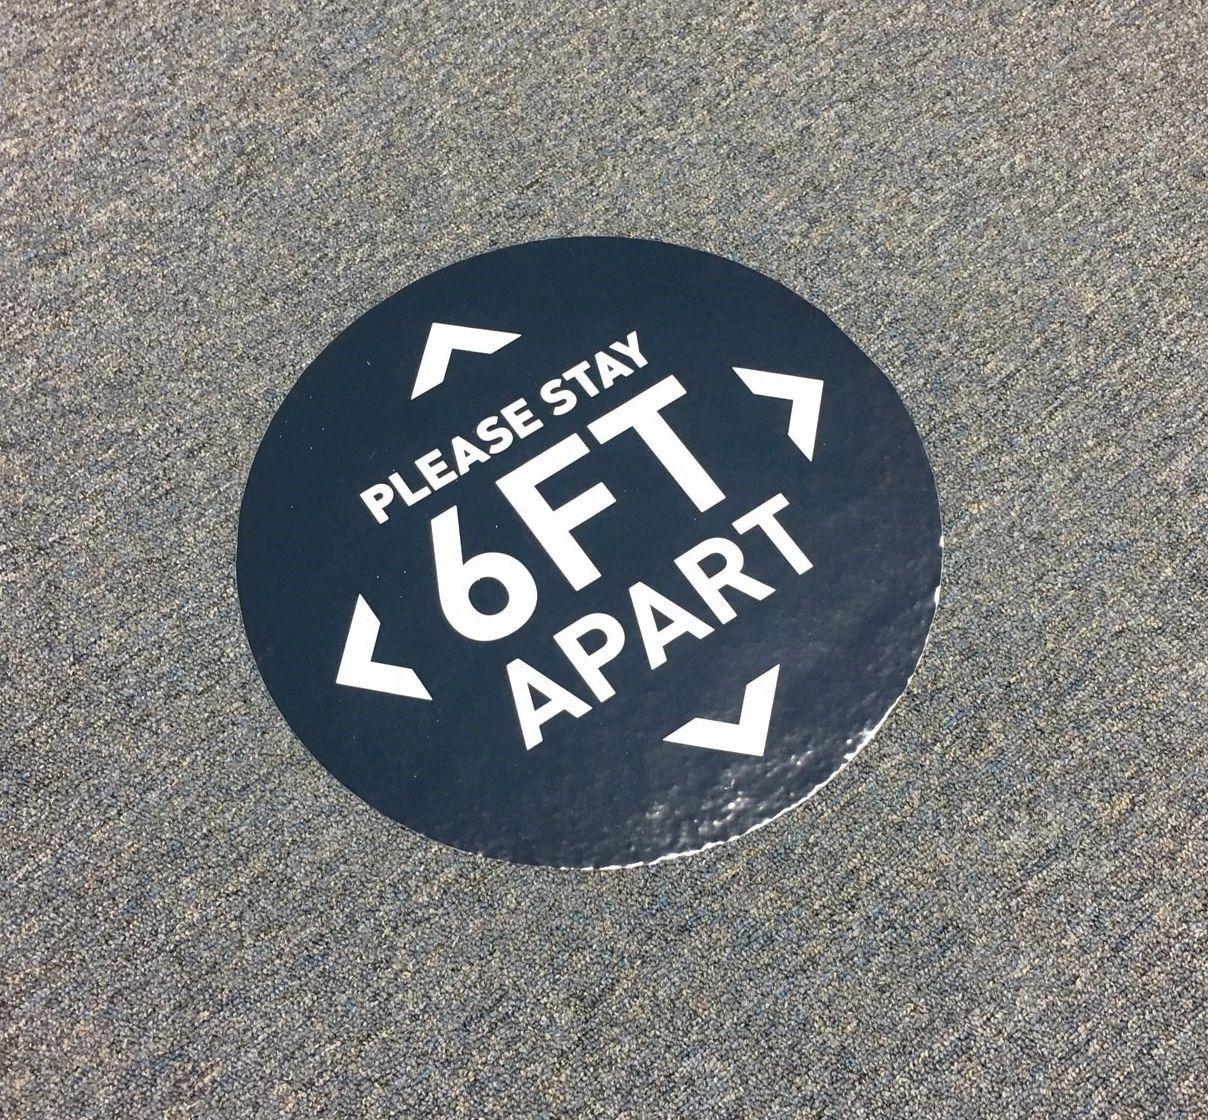 UV printed laminated floor decal